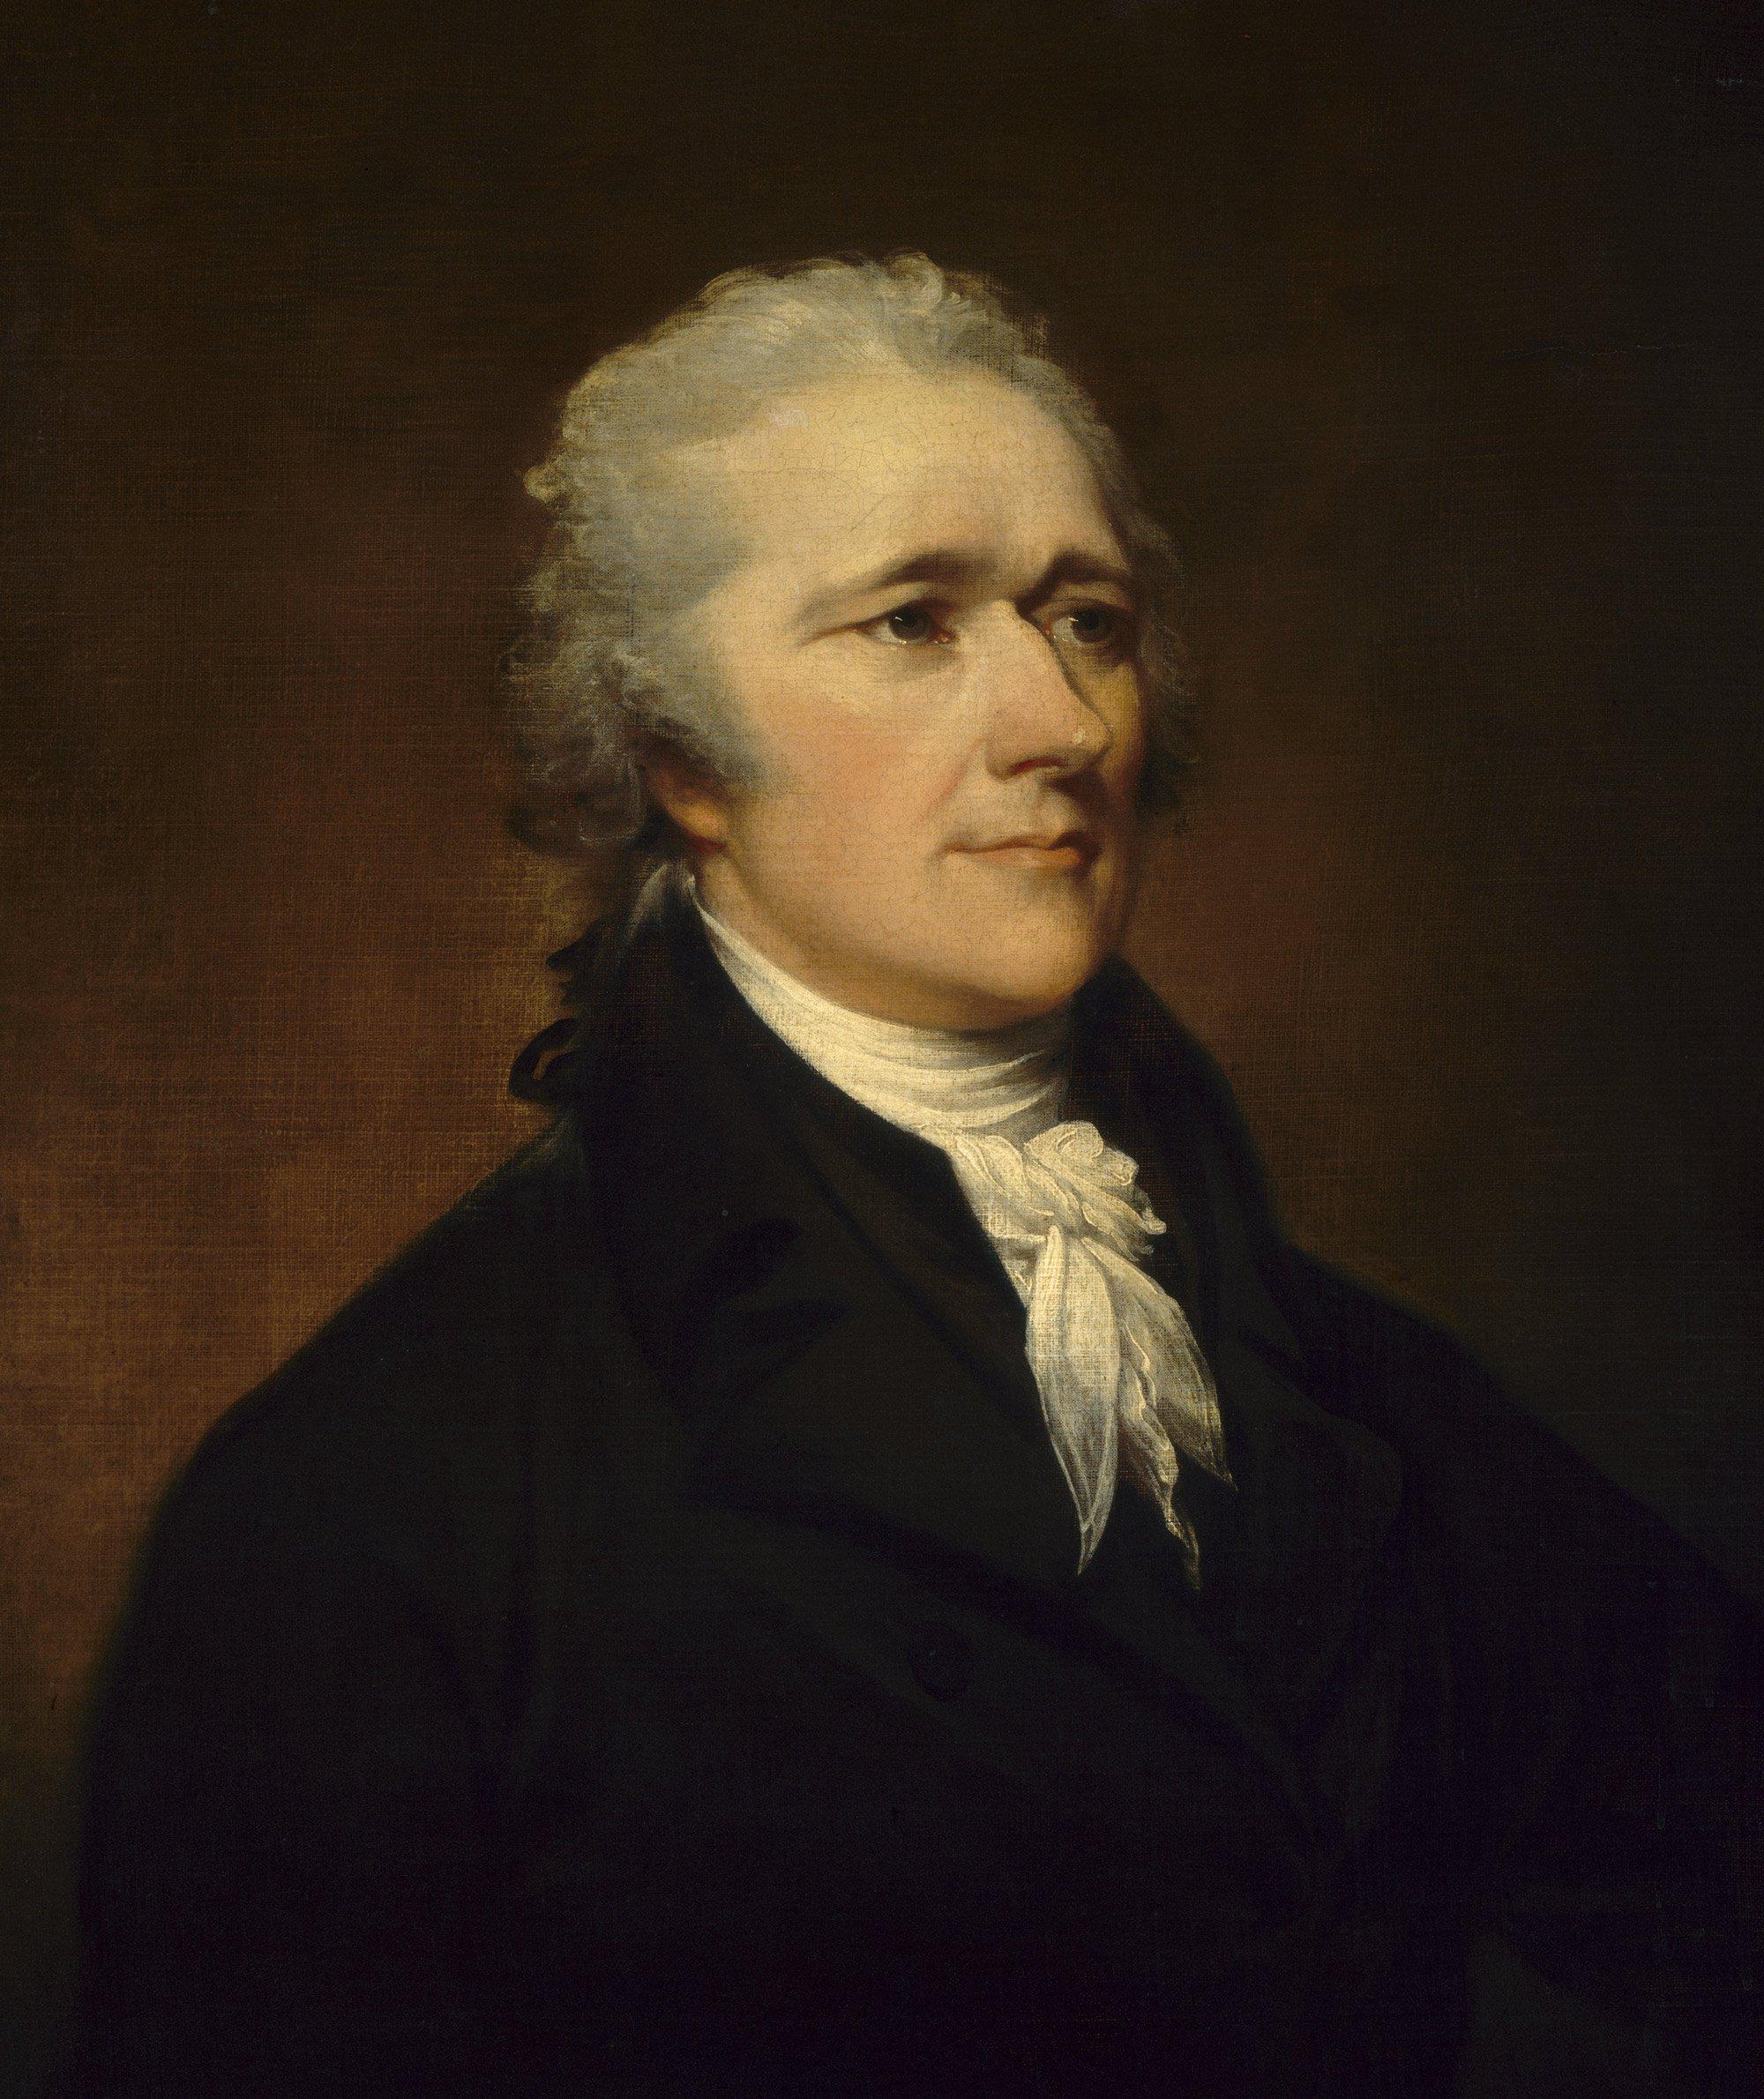 Alexander Hamilton: The Man and the Musical